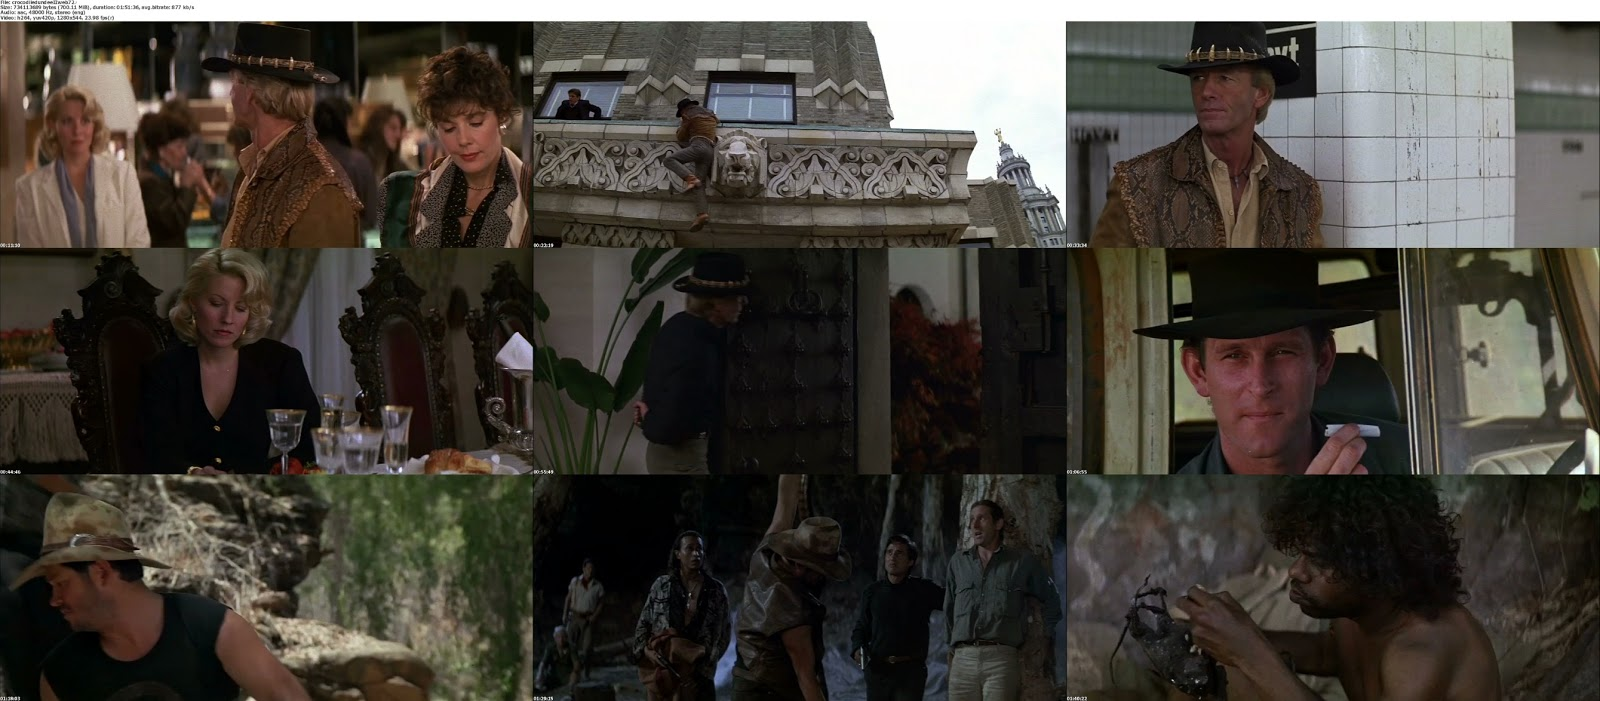 movie screenshot of Crocodile Dundee II fdmovie.com